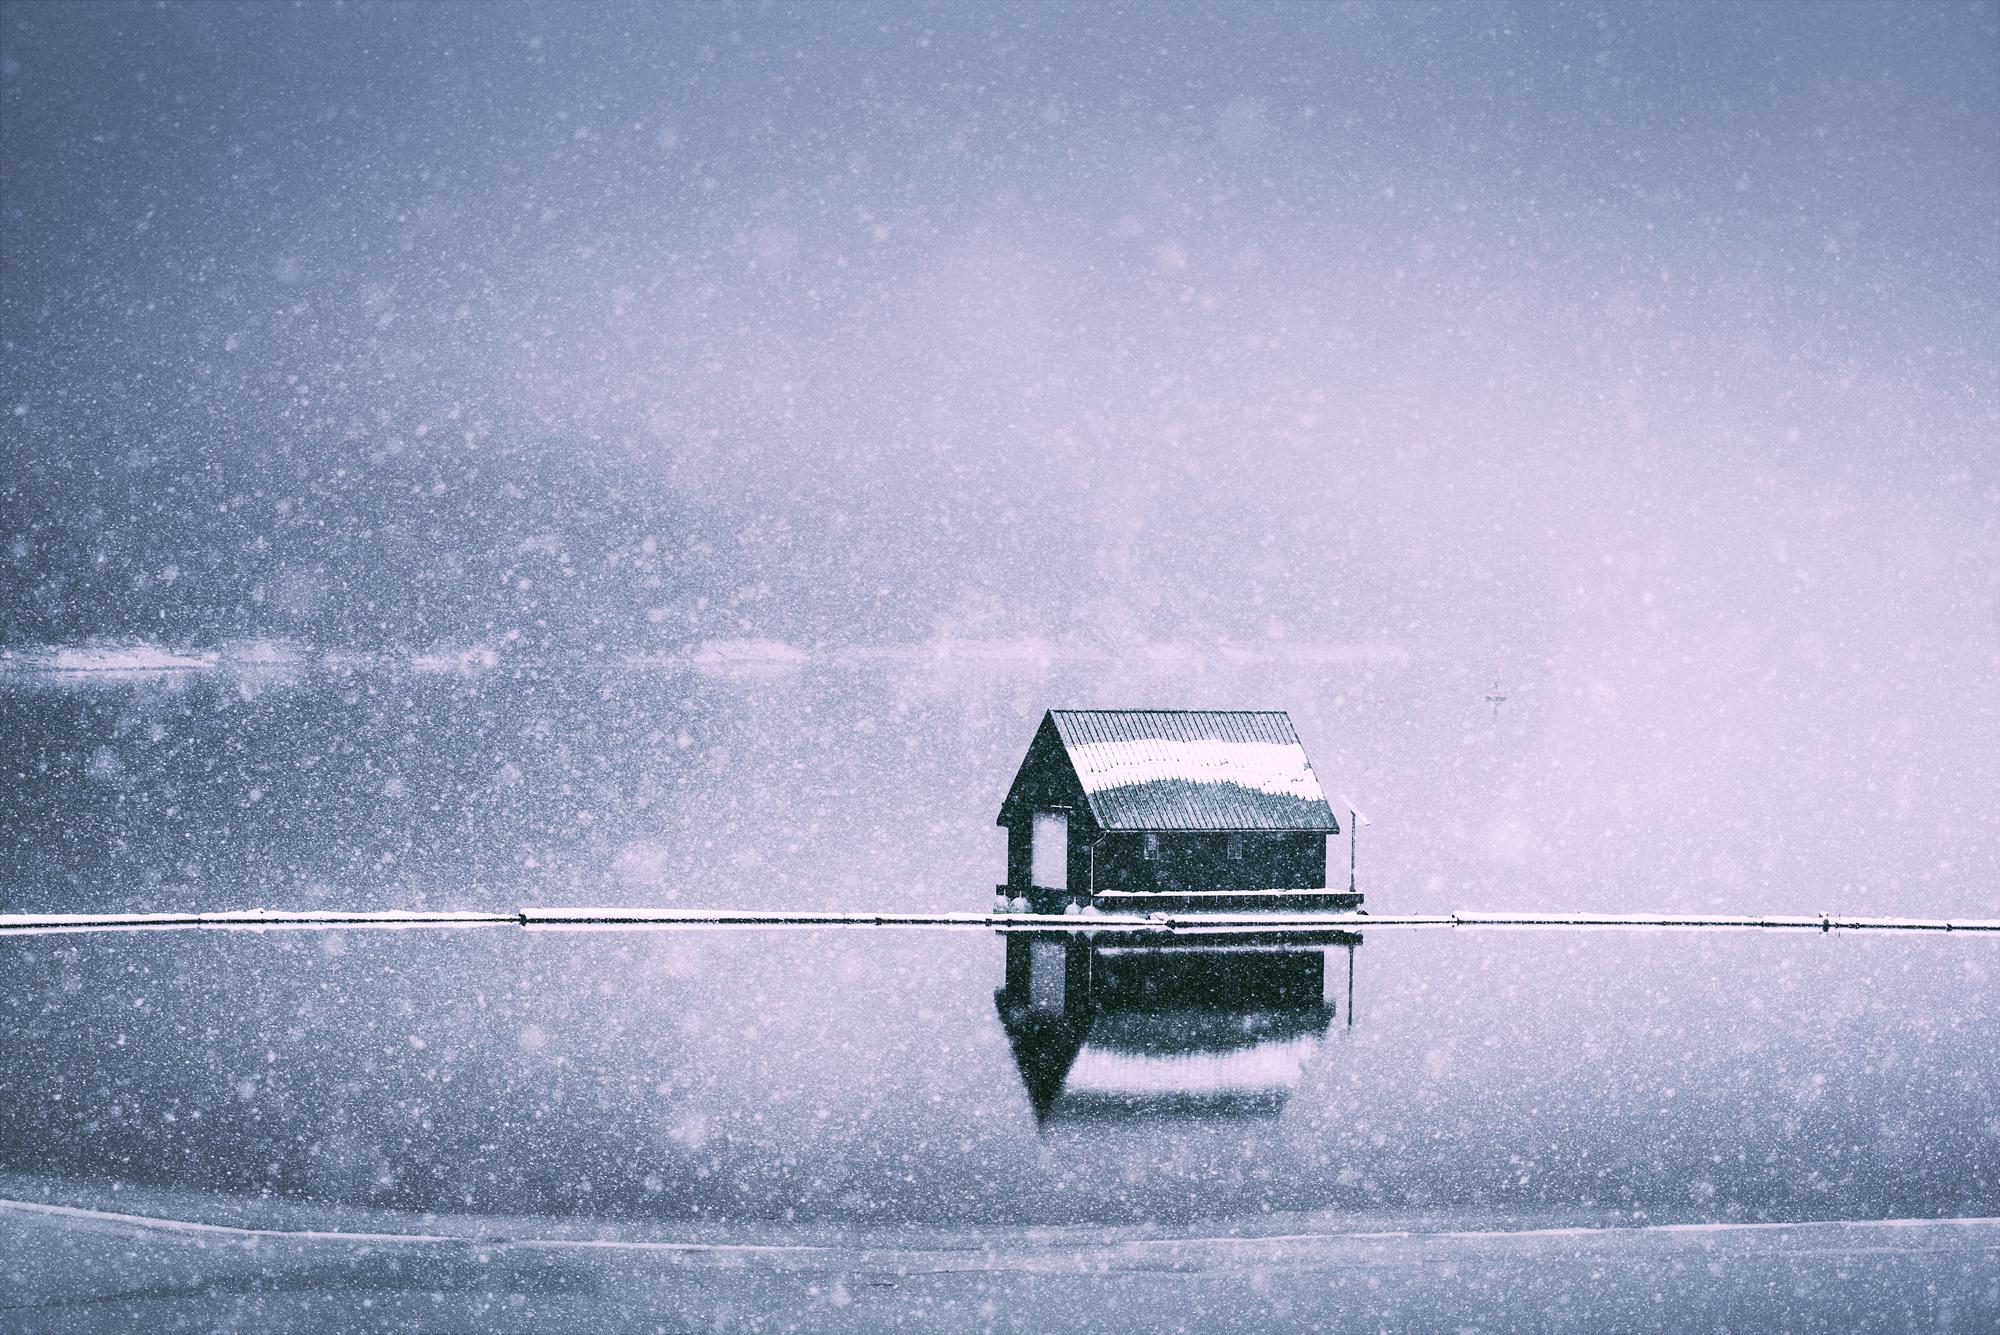 Atmospherics_Lake_House_In_The_Snow_2000px.jpg